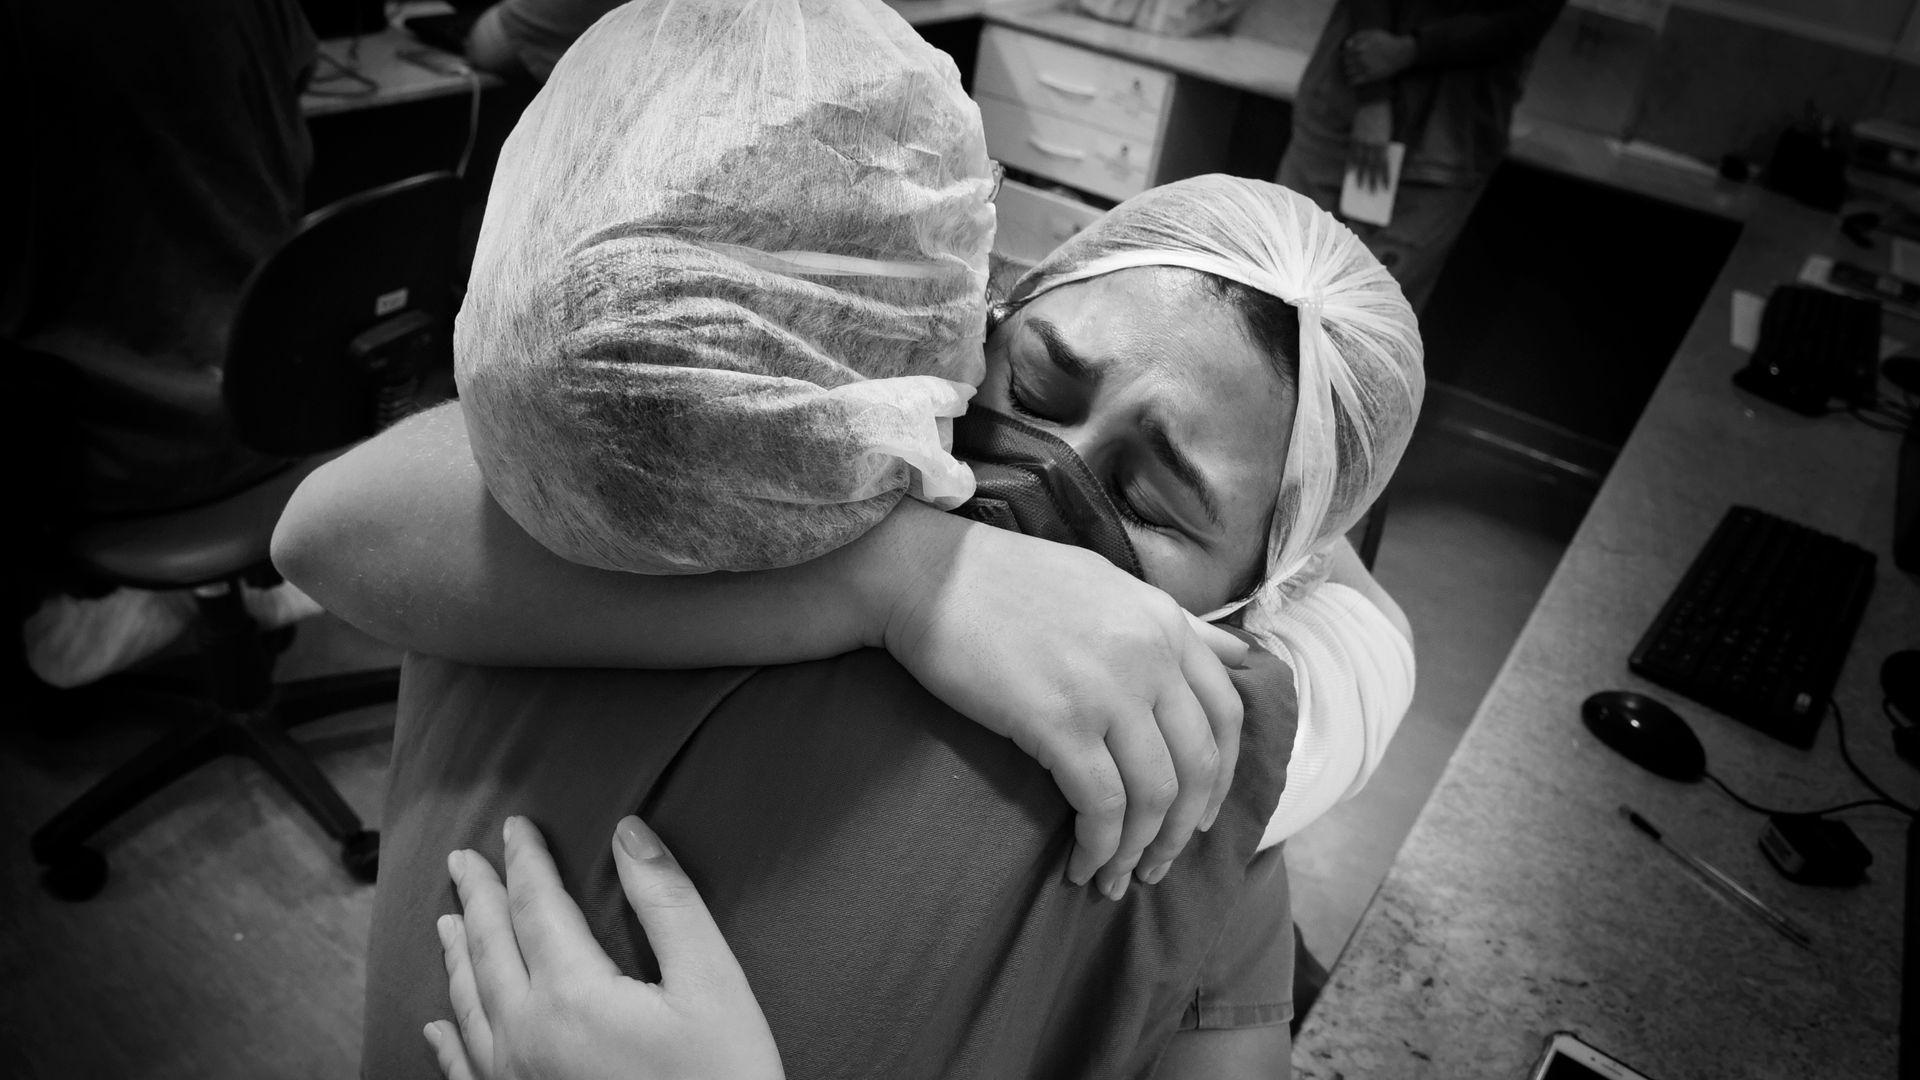 A enfermeira Laís de Castro chora abraçada à fisioterapeuta Larissa Giovannetti pela morte de paciente